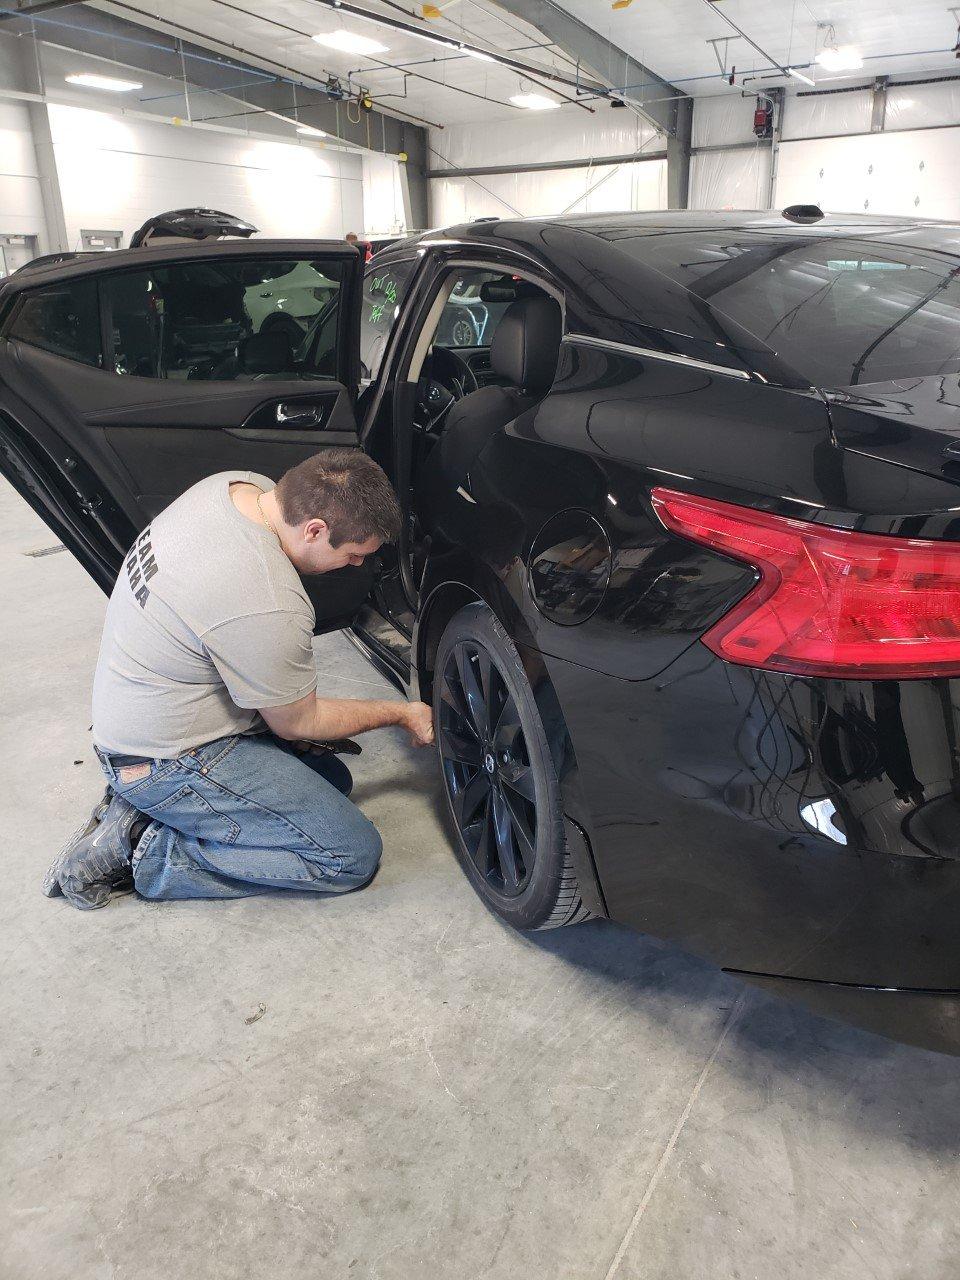 Levander Auto Is Your Complete Automotive Collision Repair Service Center